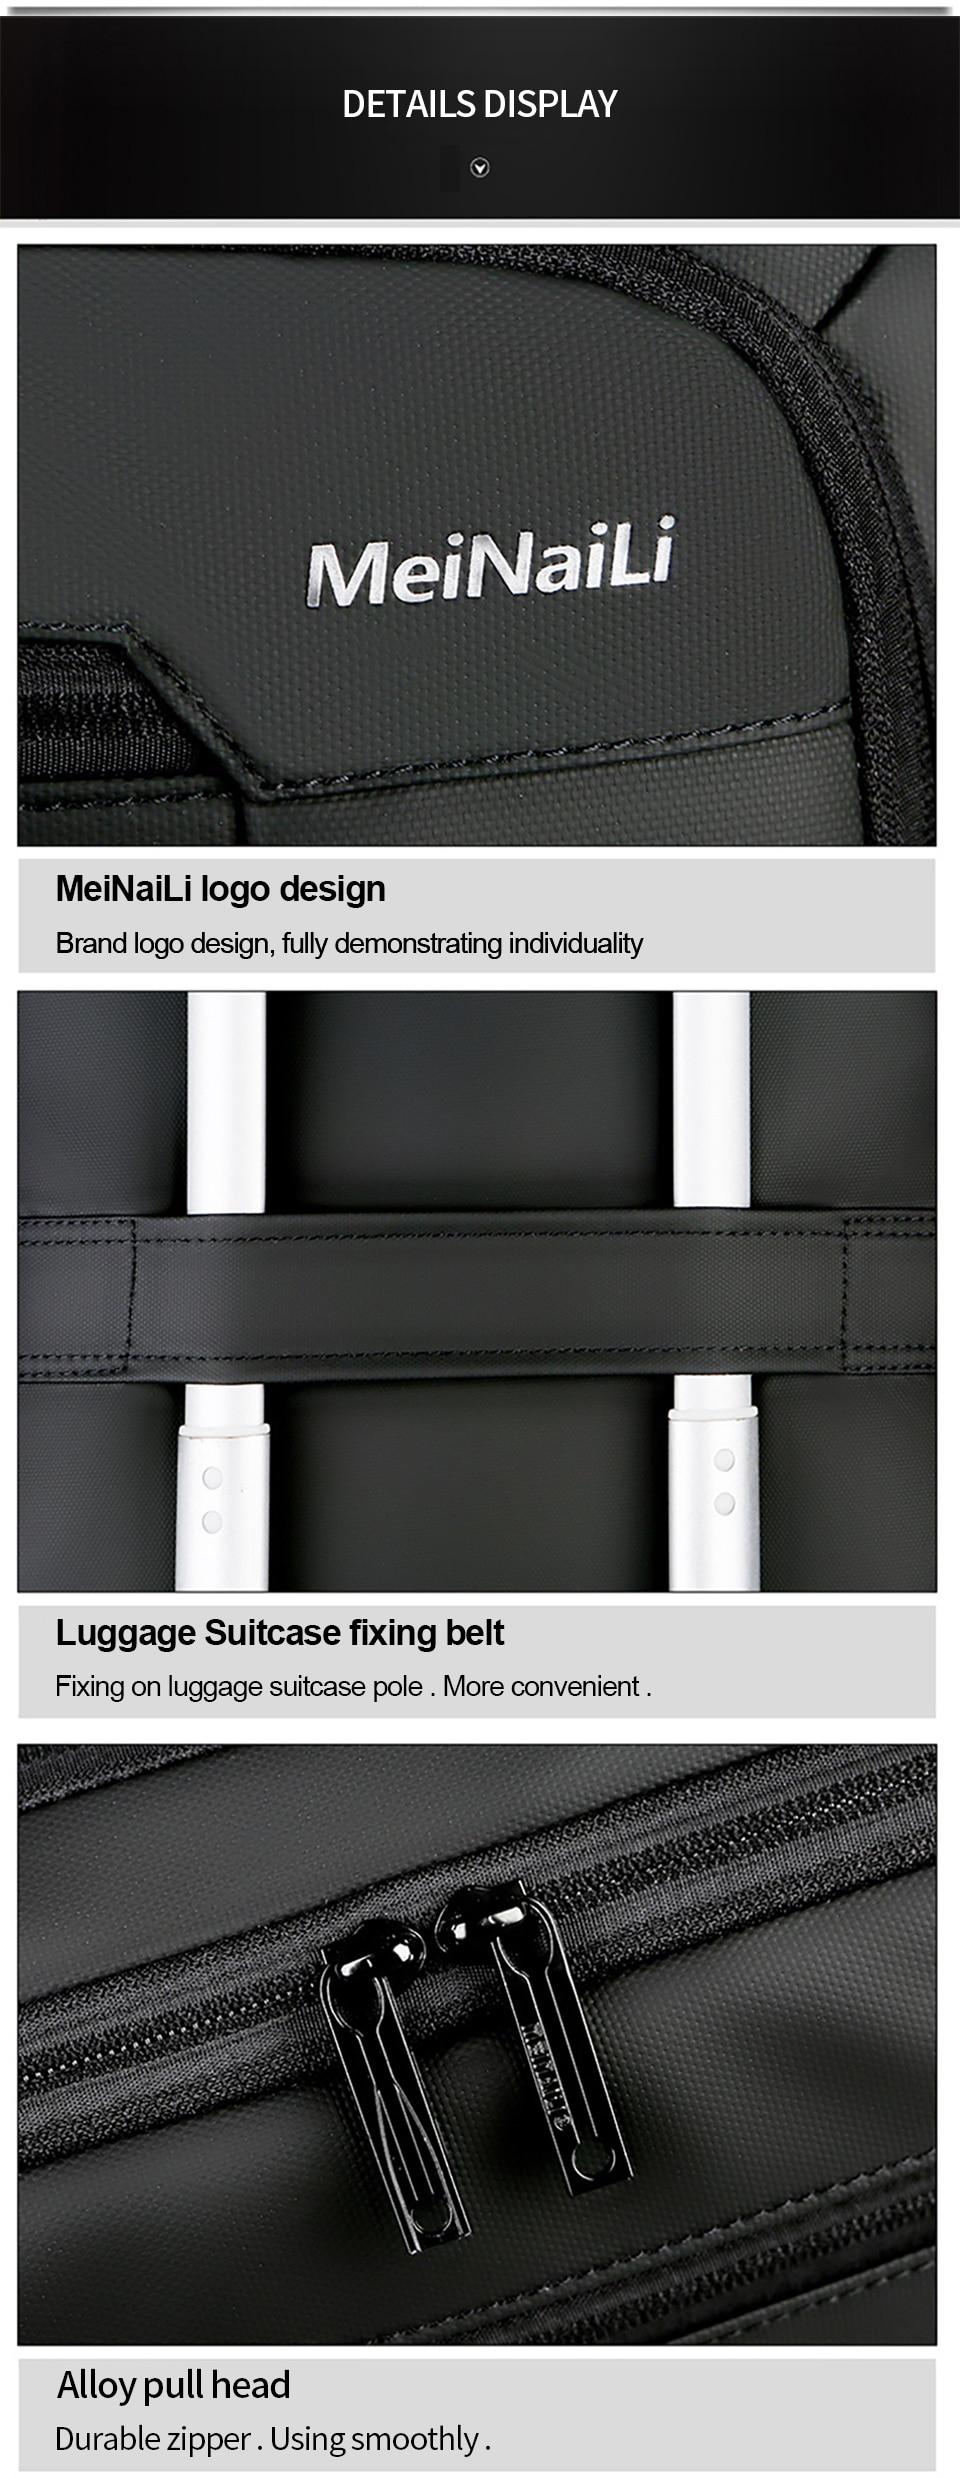 9 Multifunction USB Backpack Man Bag 15.6inch Laptop Backpacks Travel Bags Large Capacity Luggage Backpacking Waterproof Notebook